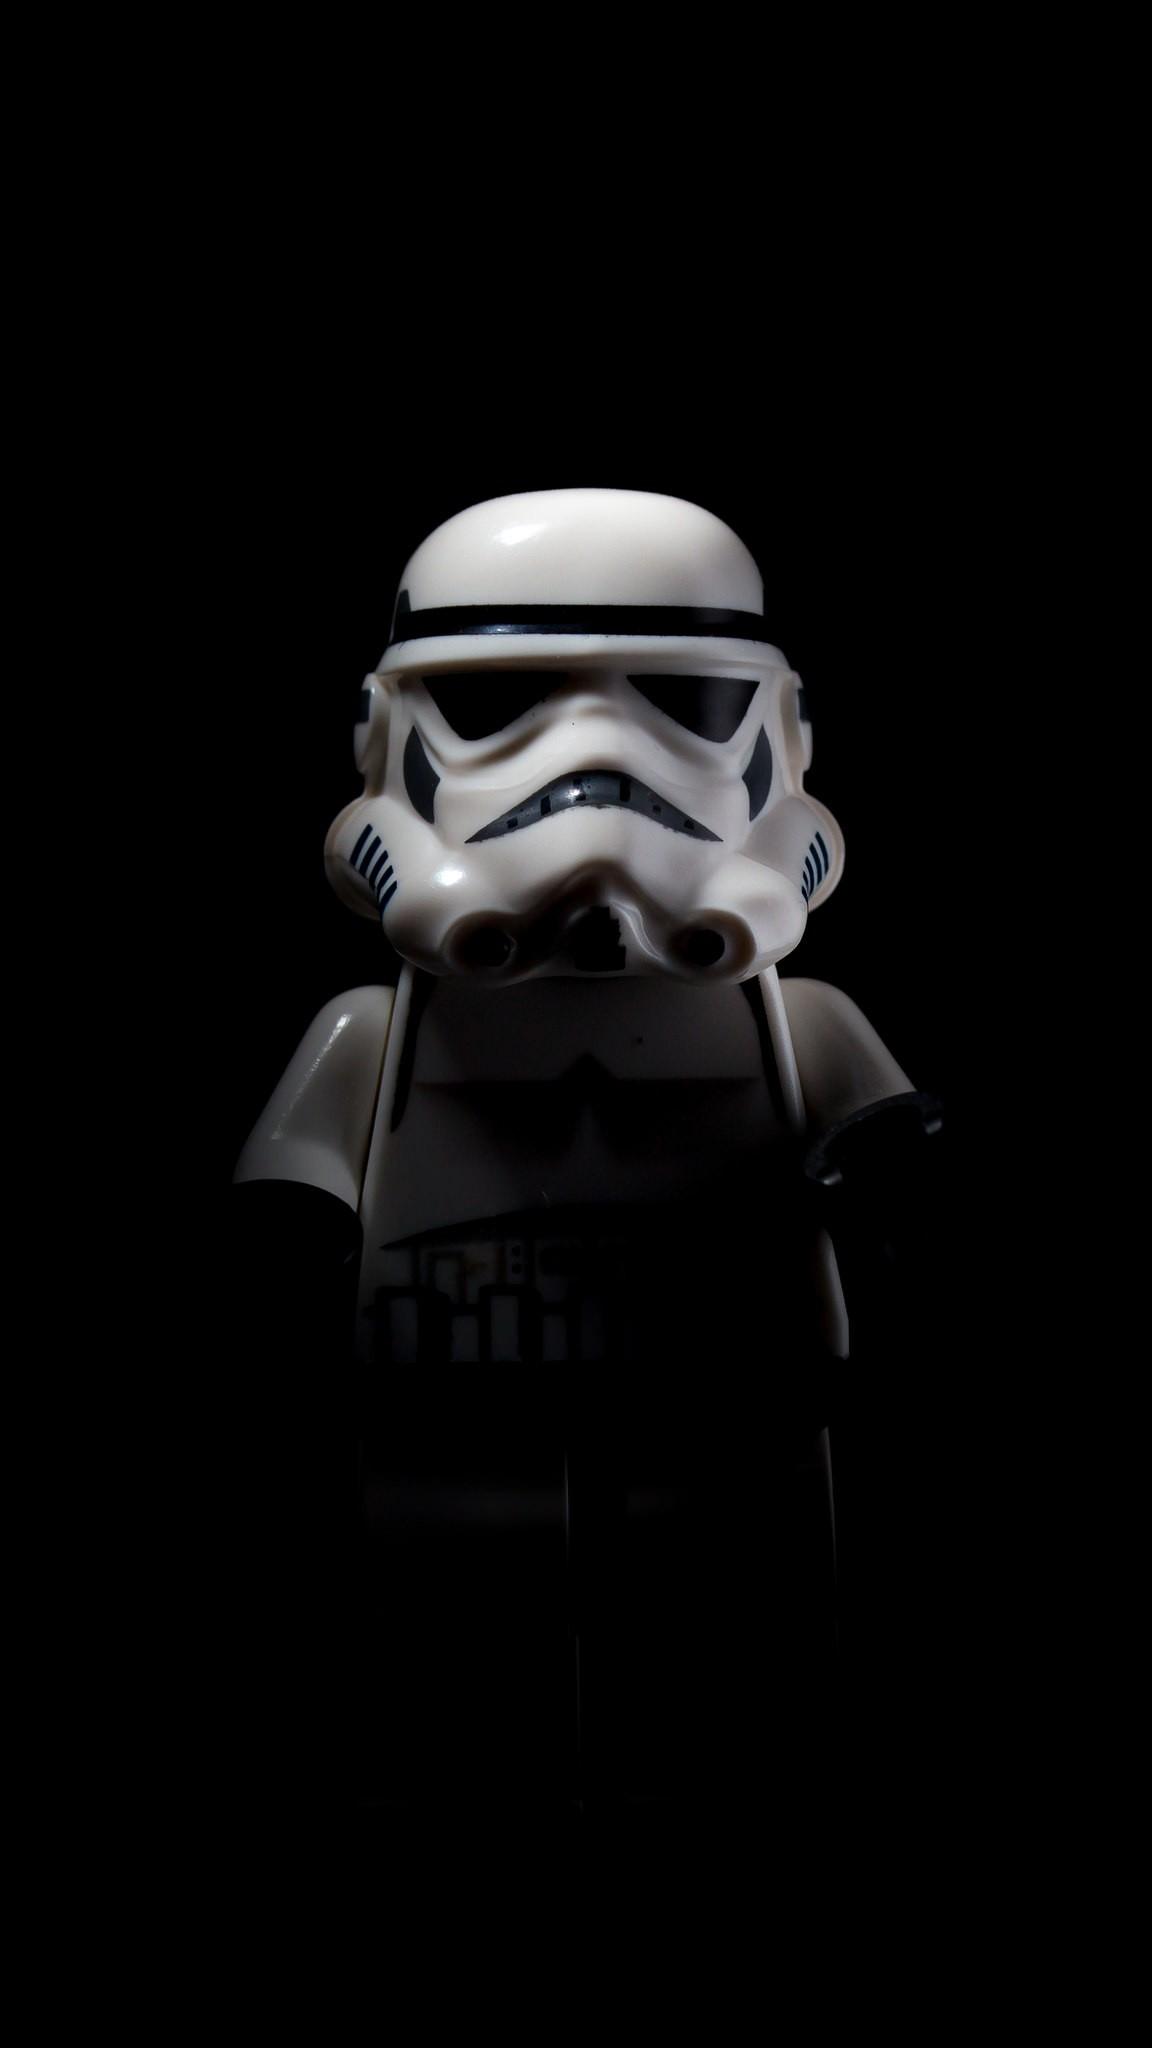 Download Shadow Trooper Wallpaper Hd Backgrounds Download